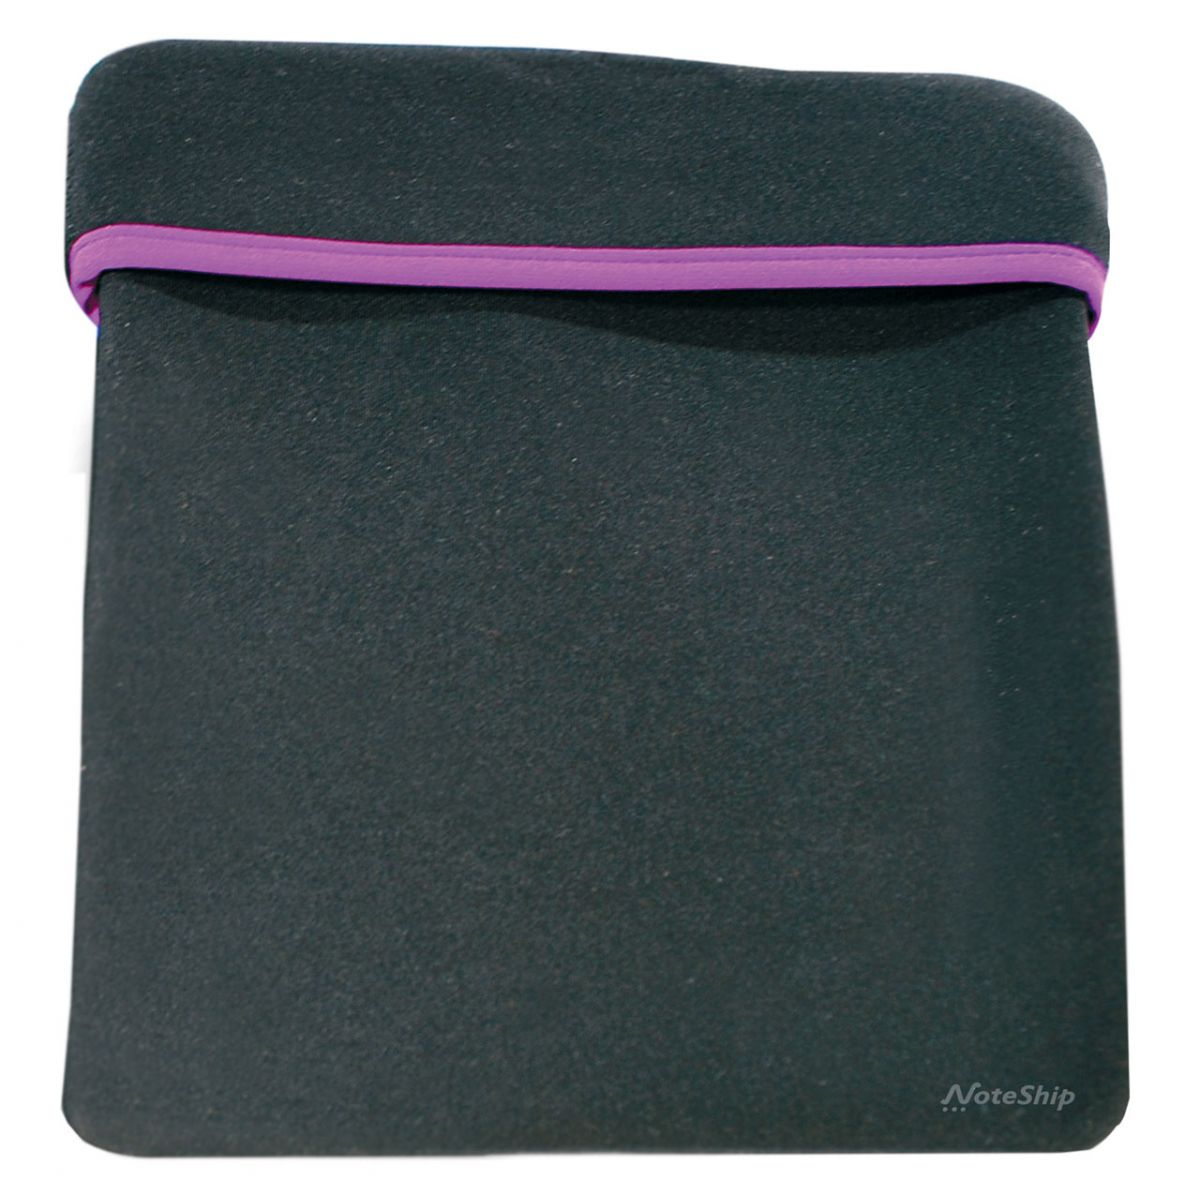 Case para Notebook 15.6 Glove Violeta 2625 - Leadership